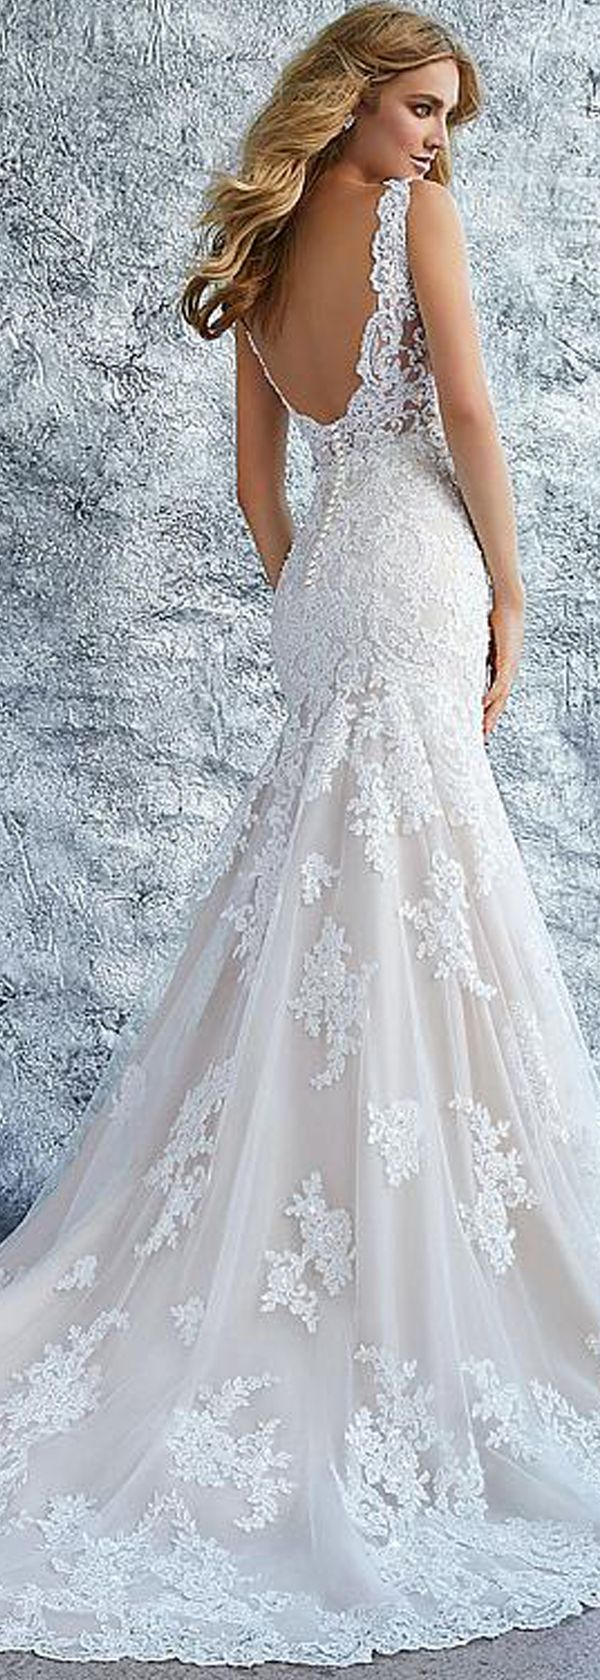 Mermaid Wedding Dresses : Chic Tulle & Organza V-neck Neckline Mermaid Wedding Dress With Beaded Lace